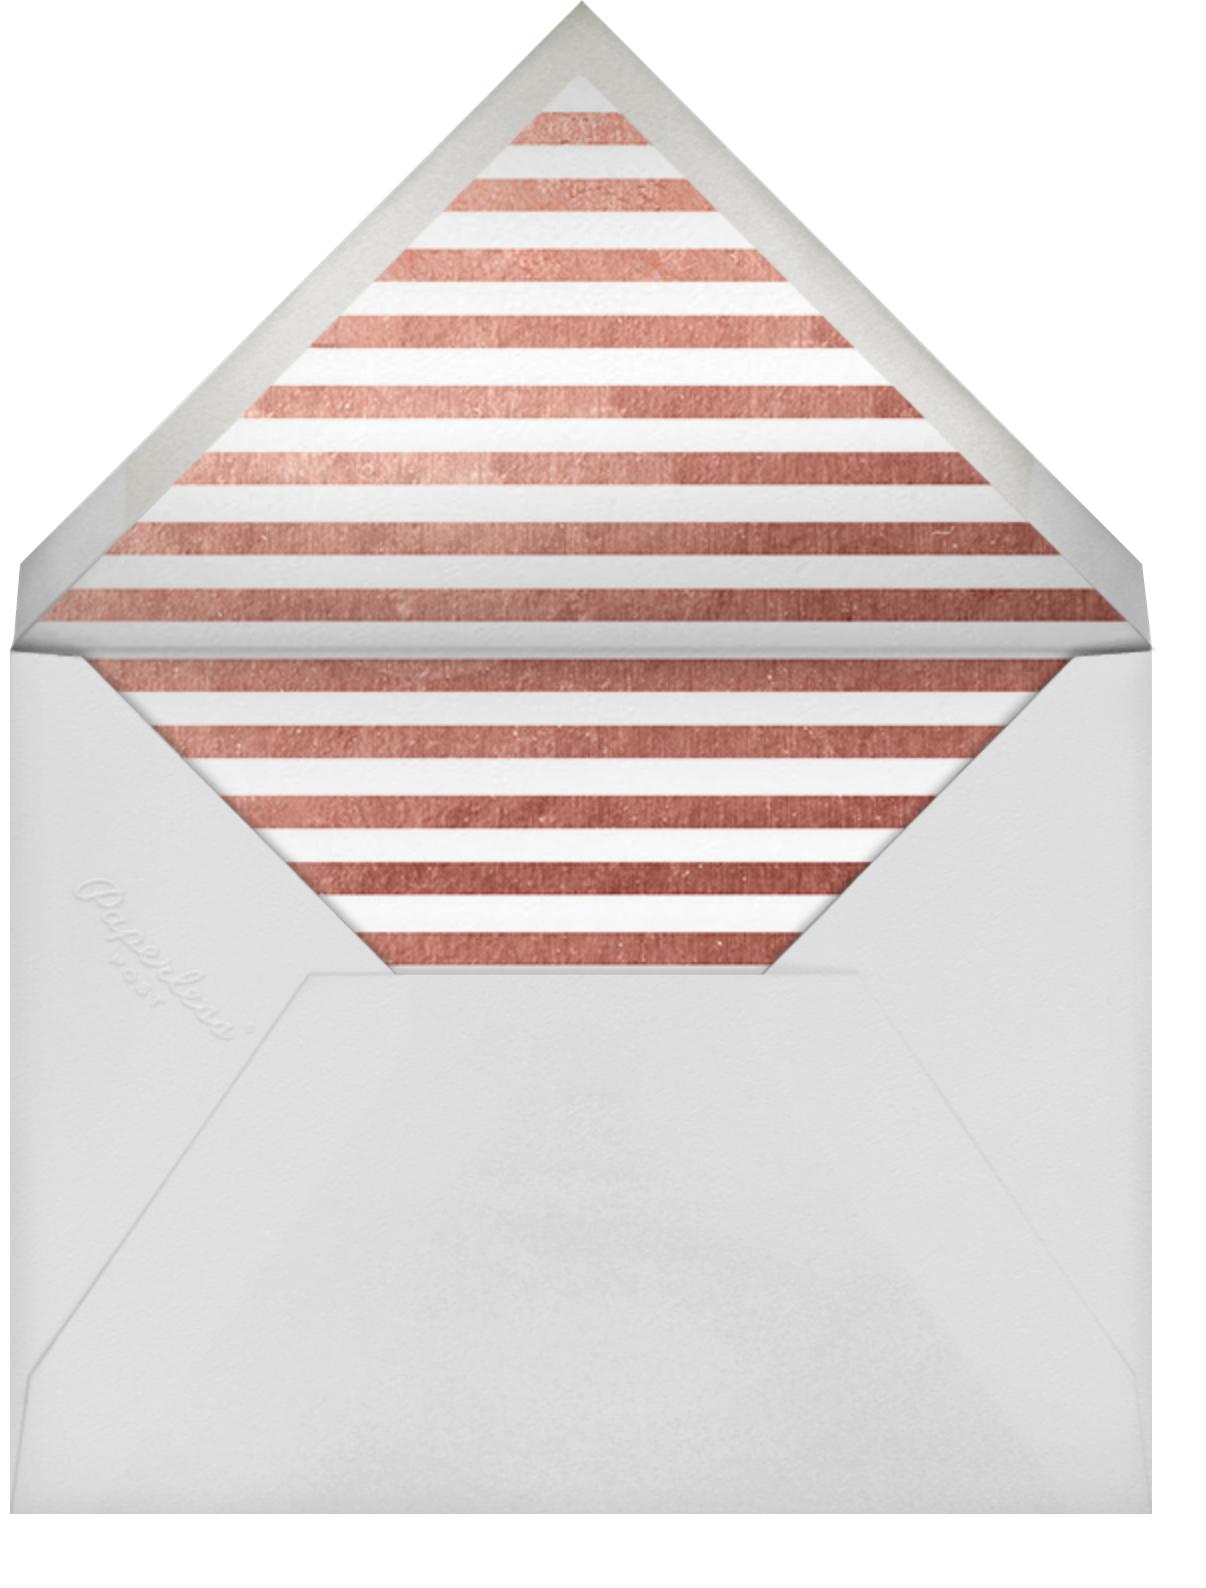 Confetti (Tall) - Navy/Rose Gold - kate spade new york - Adult birthday - envelope back